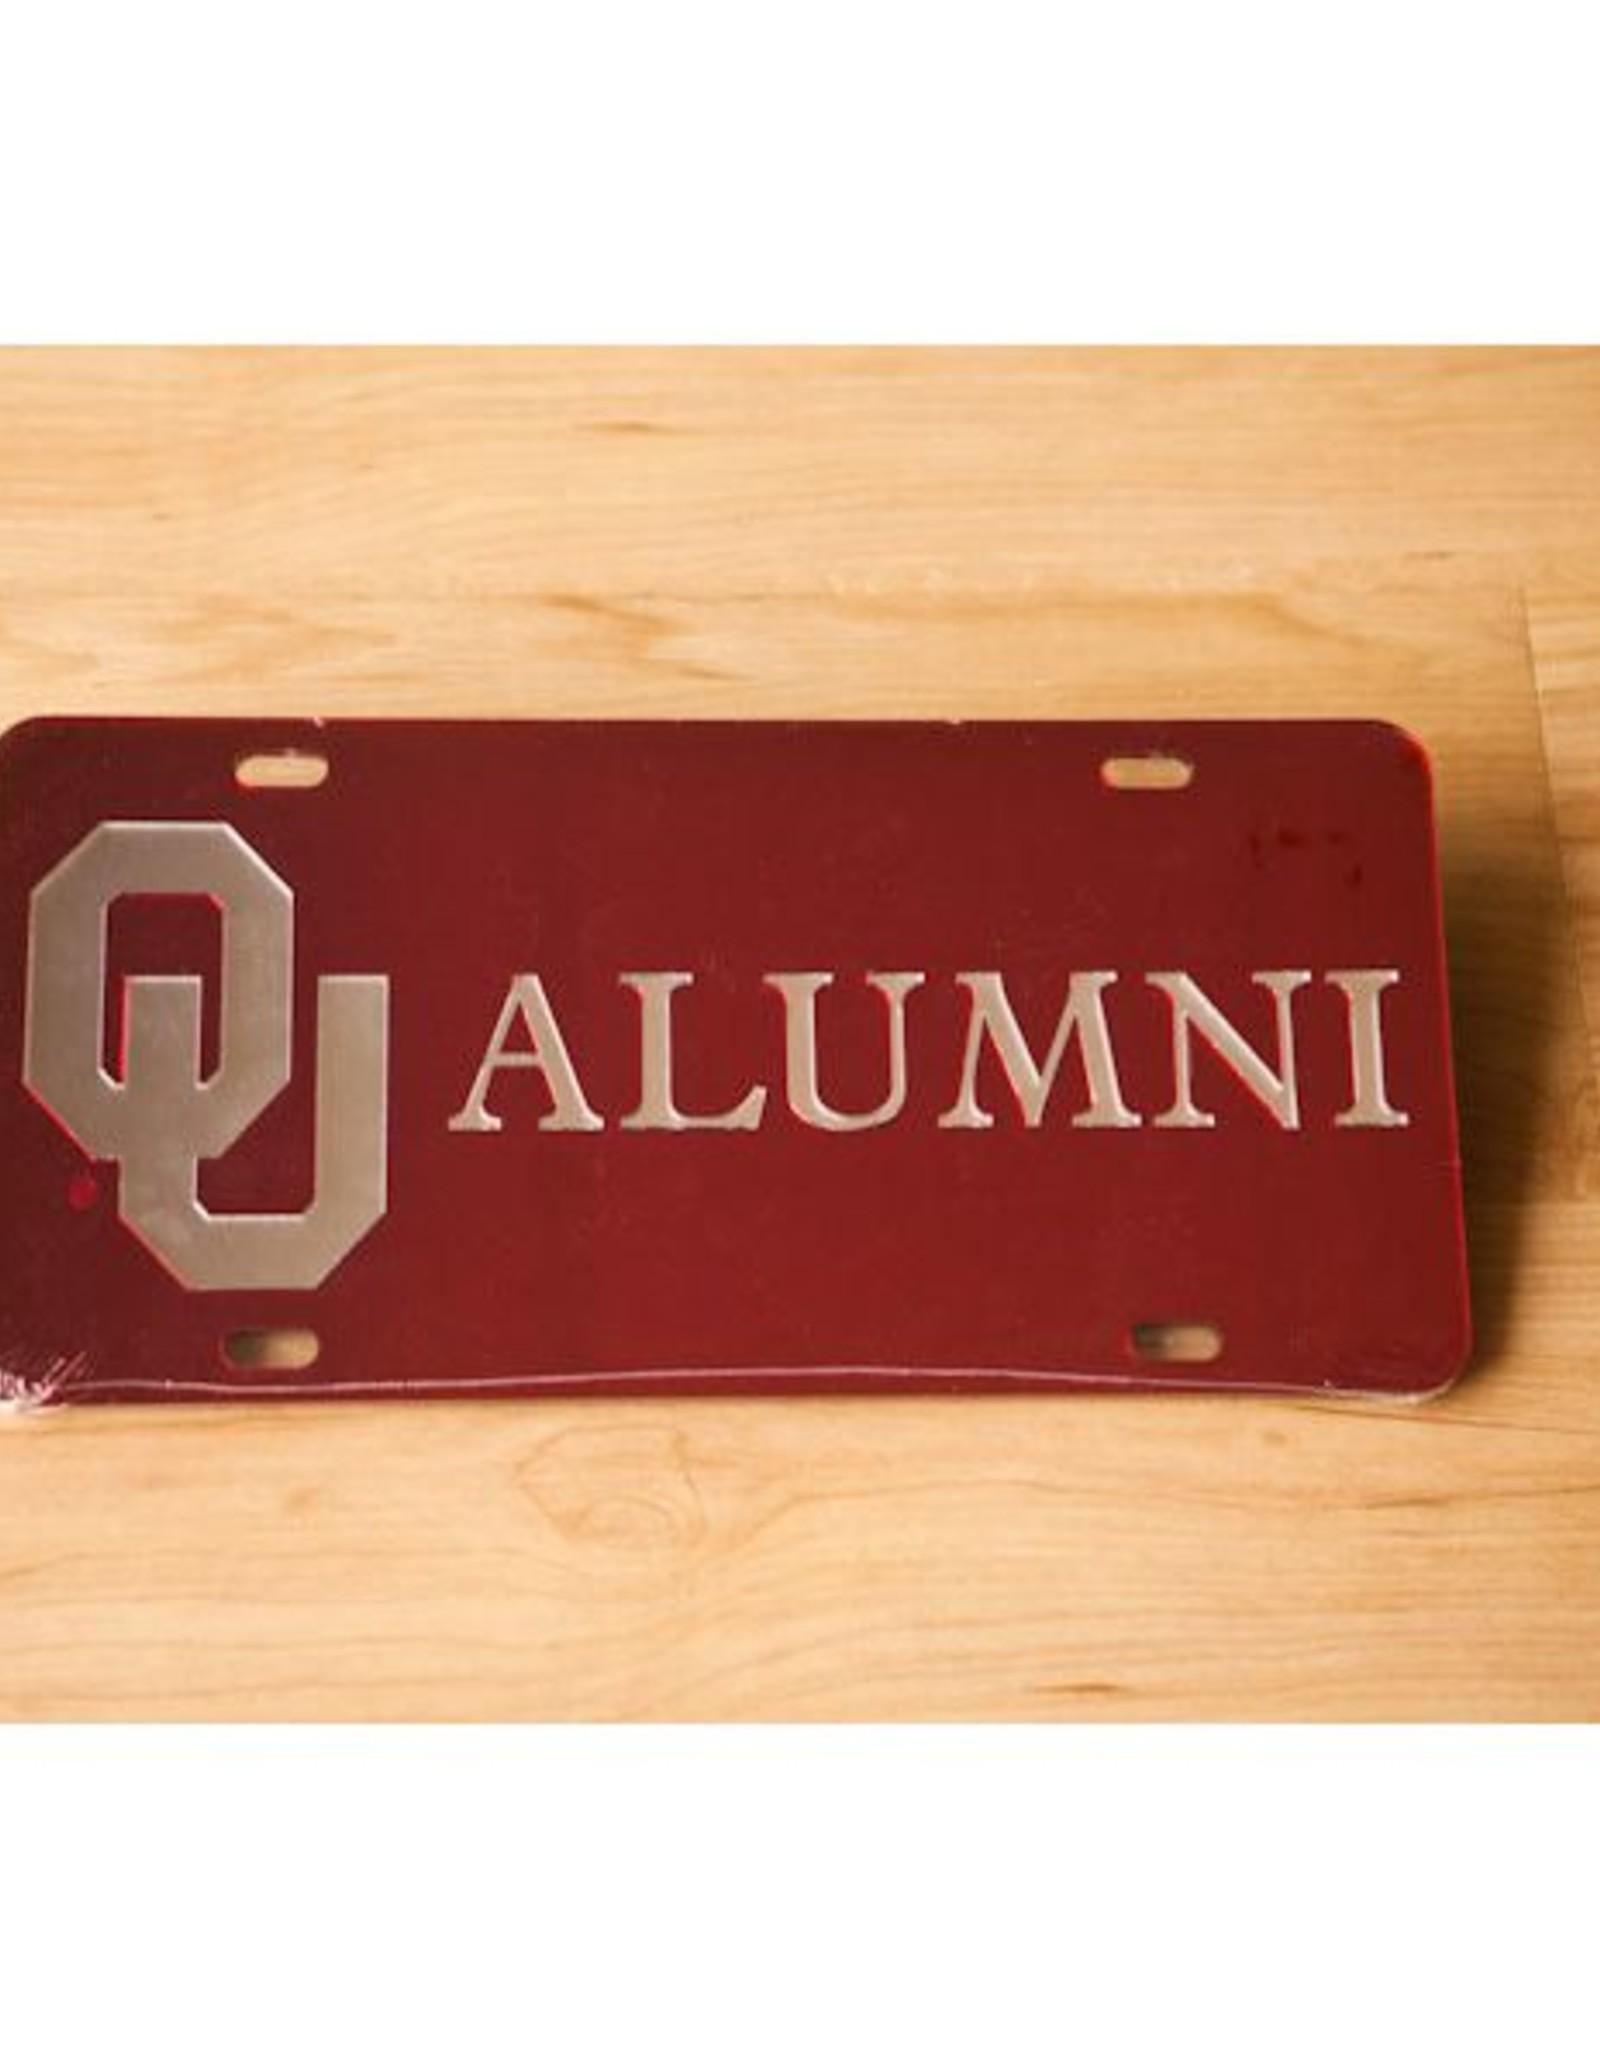 Craftique Craftique OU Alumni Silver/Crimson Mirrored License Plate